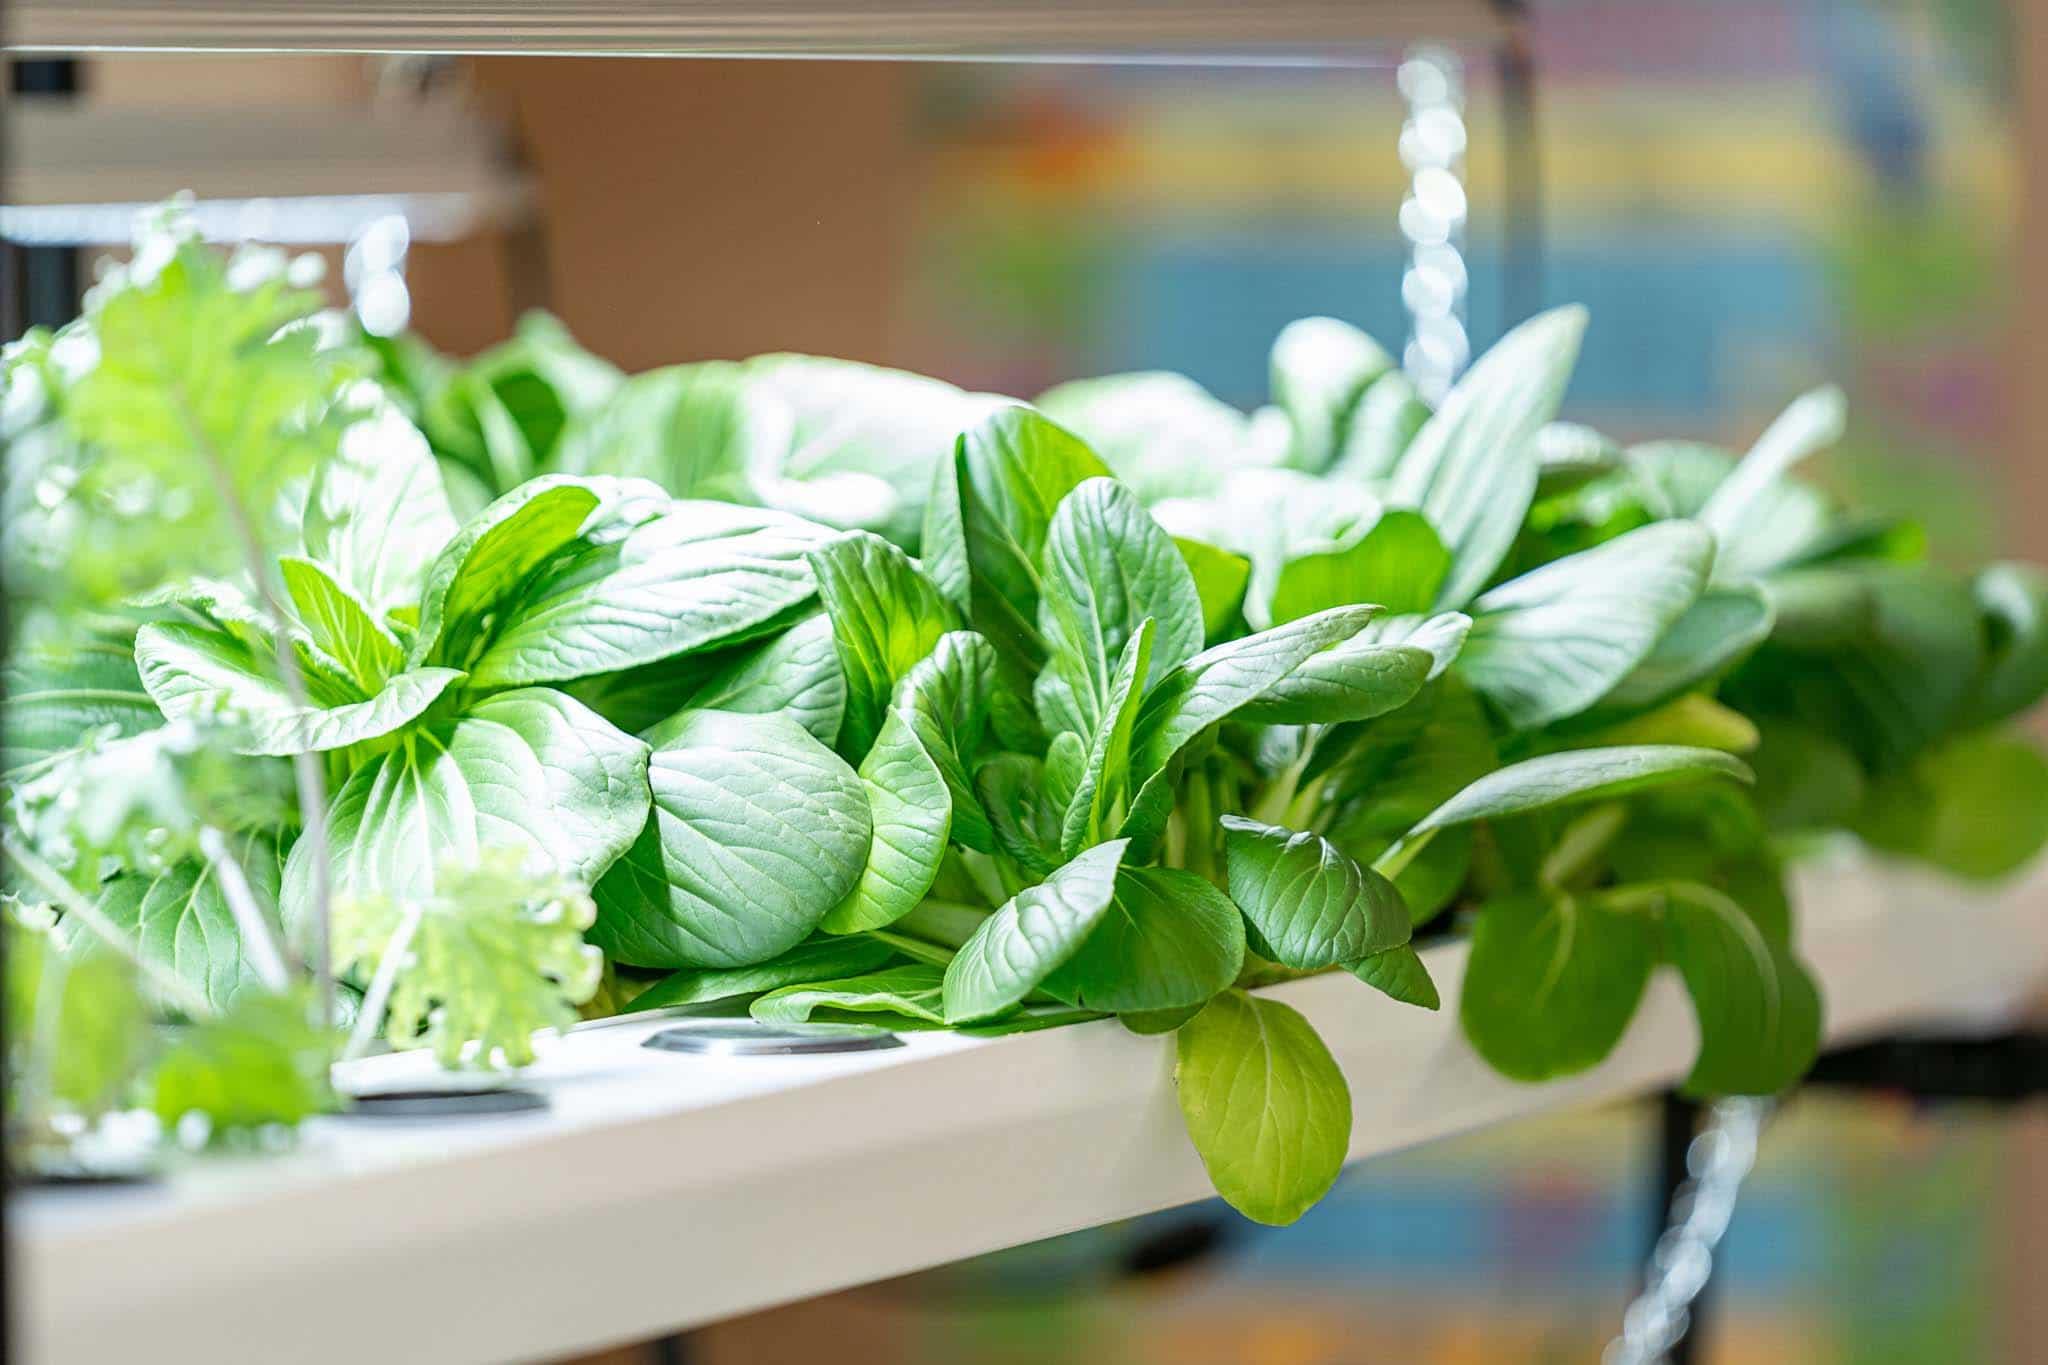 vireo garden salad